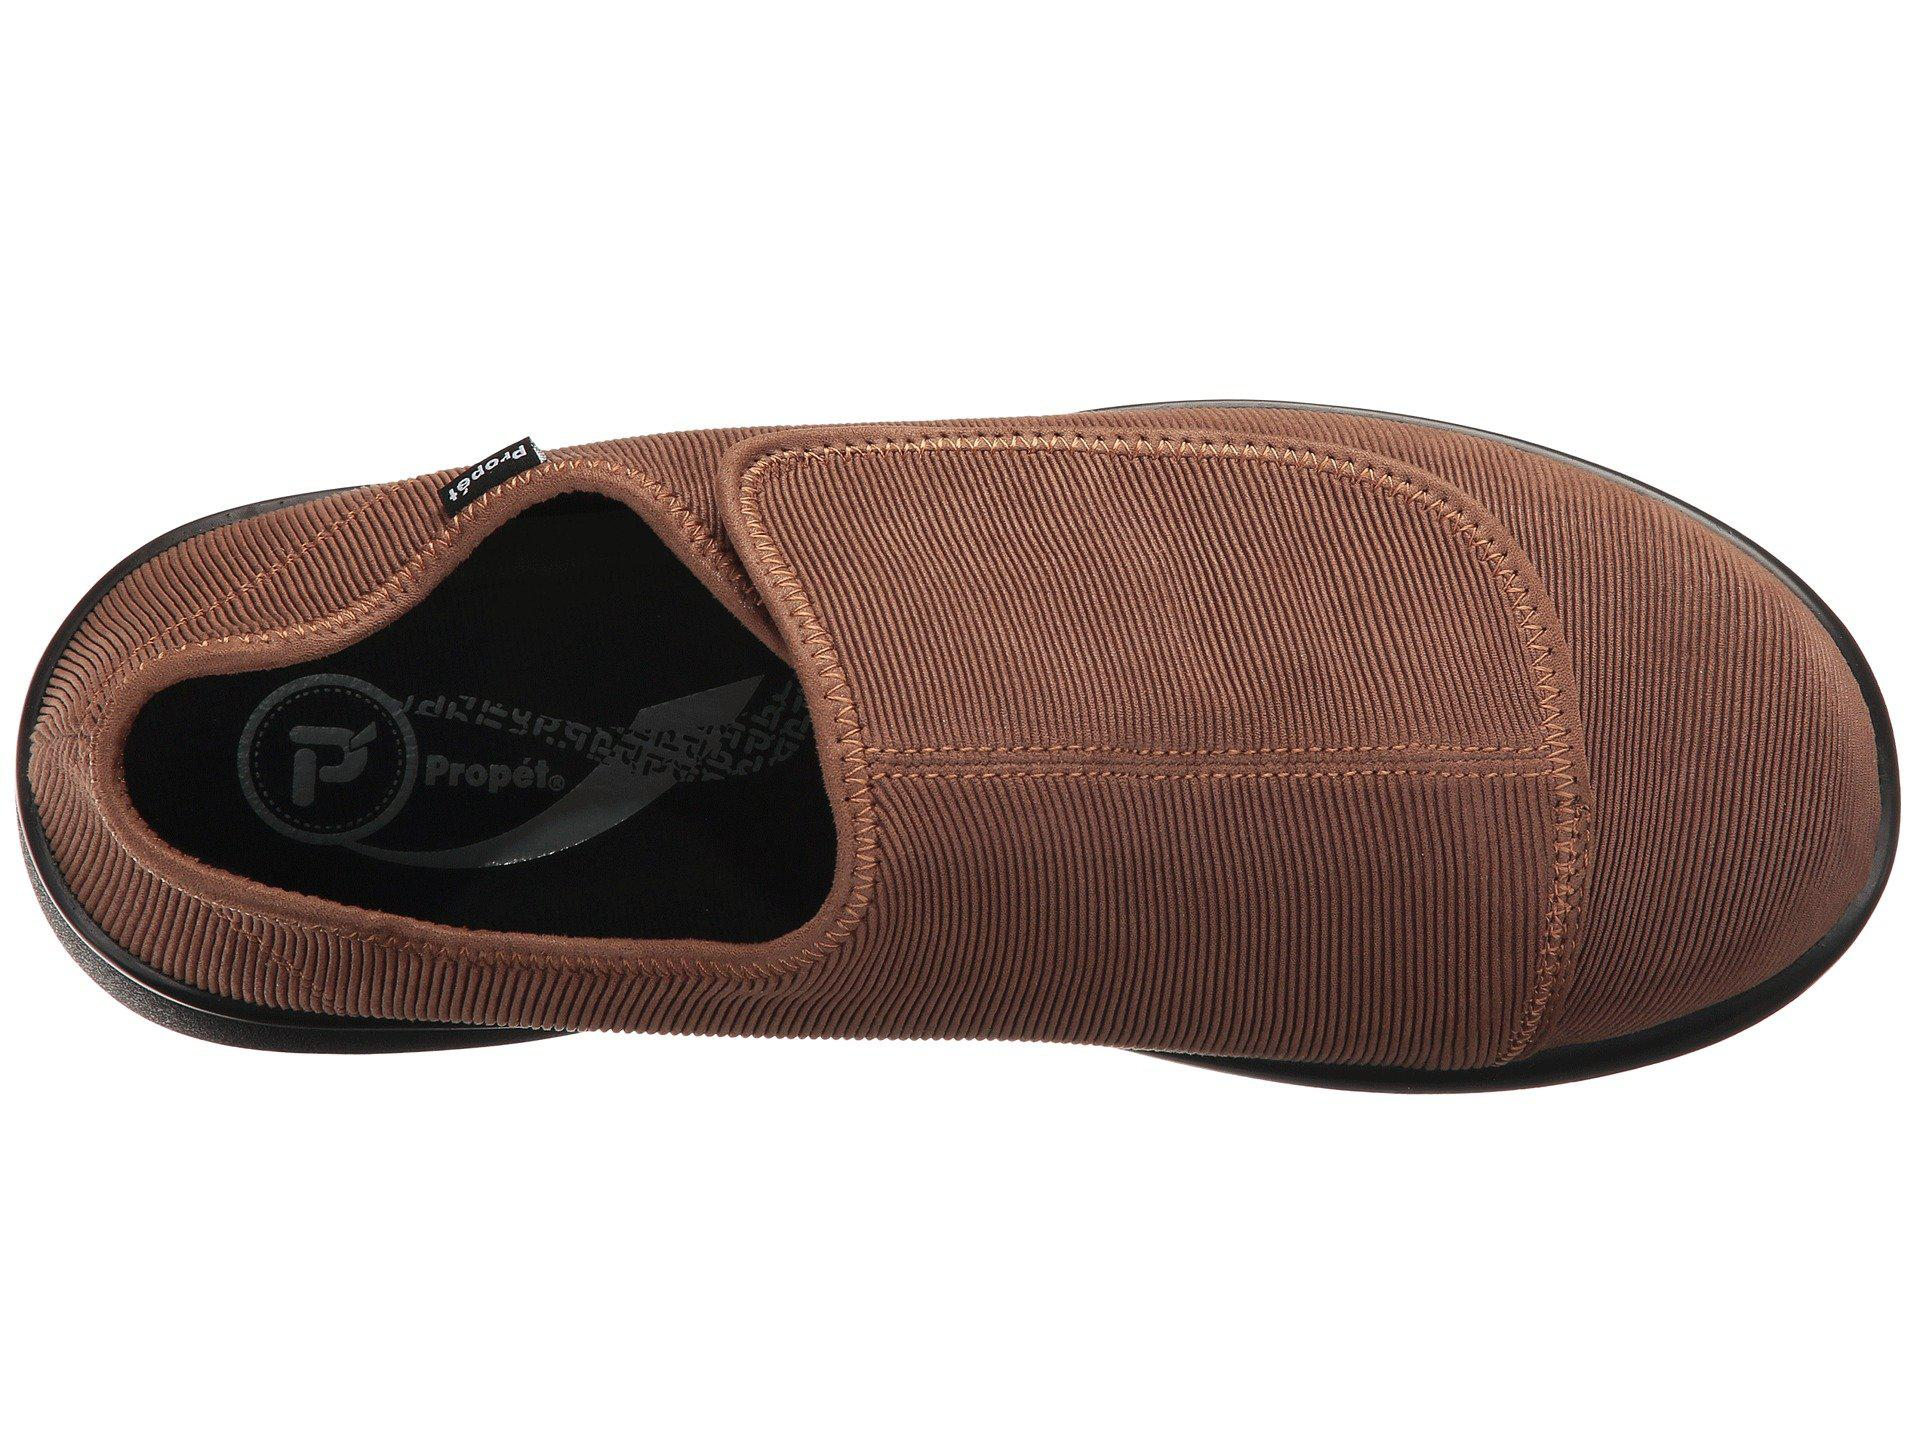 ed0c97c704bb Propet - Brown Cush  n Foot Medicare hcpcs Code   A5500 Diabetic Shoe (.  View fullscreen